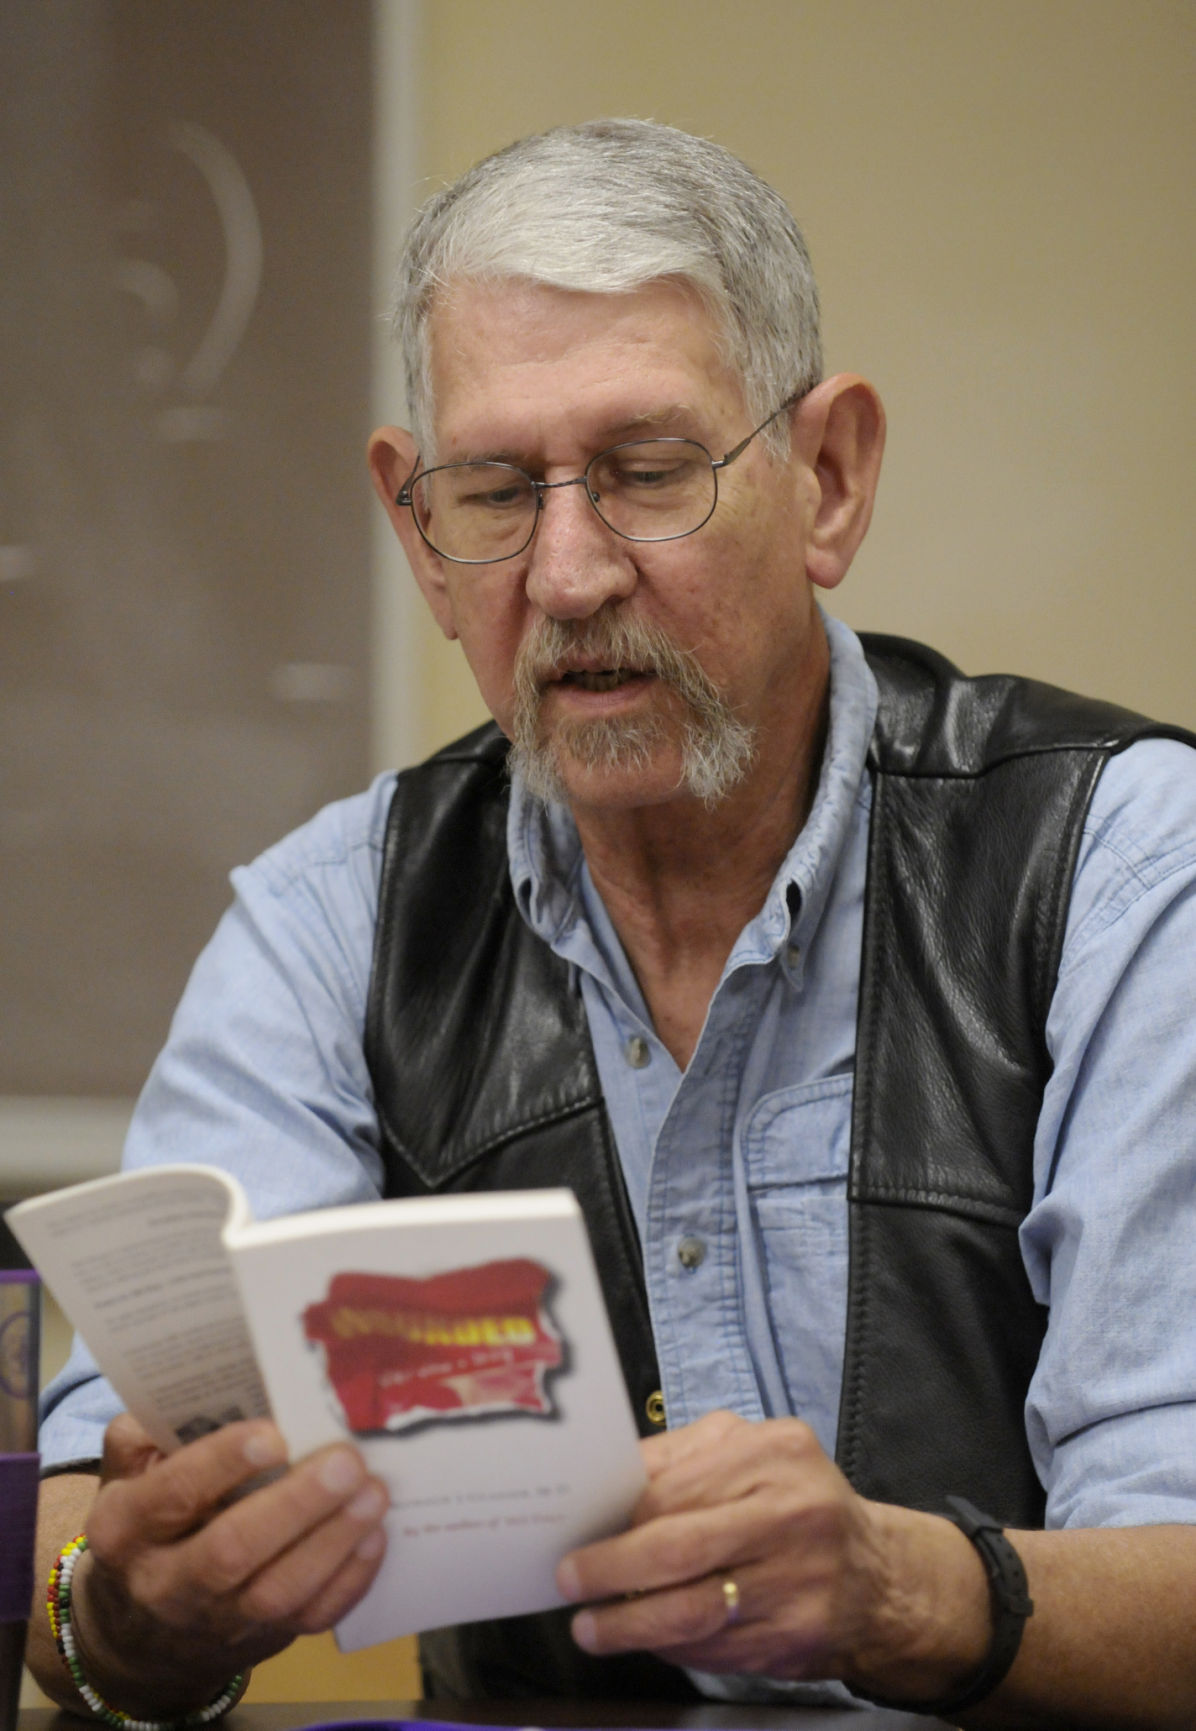 Veteran Chuck Yates